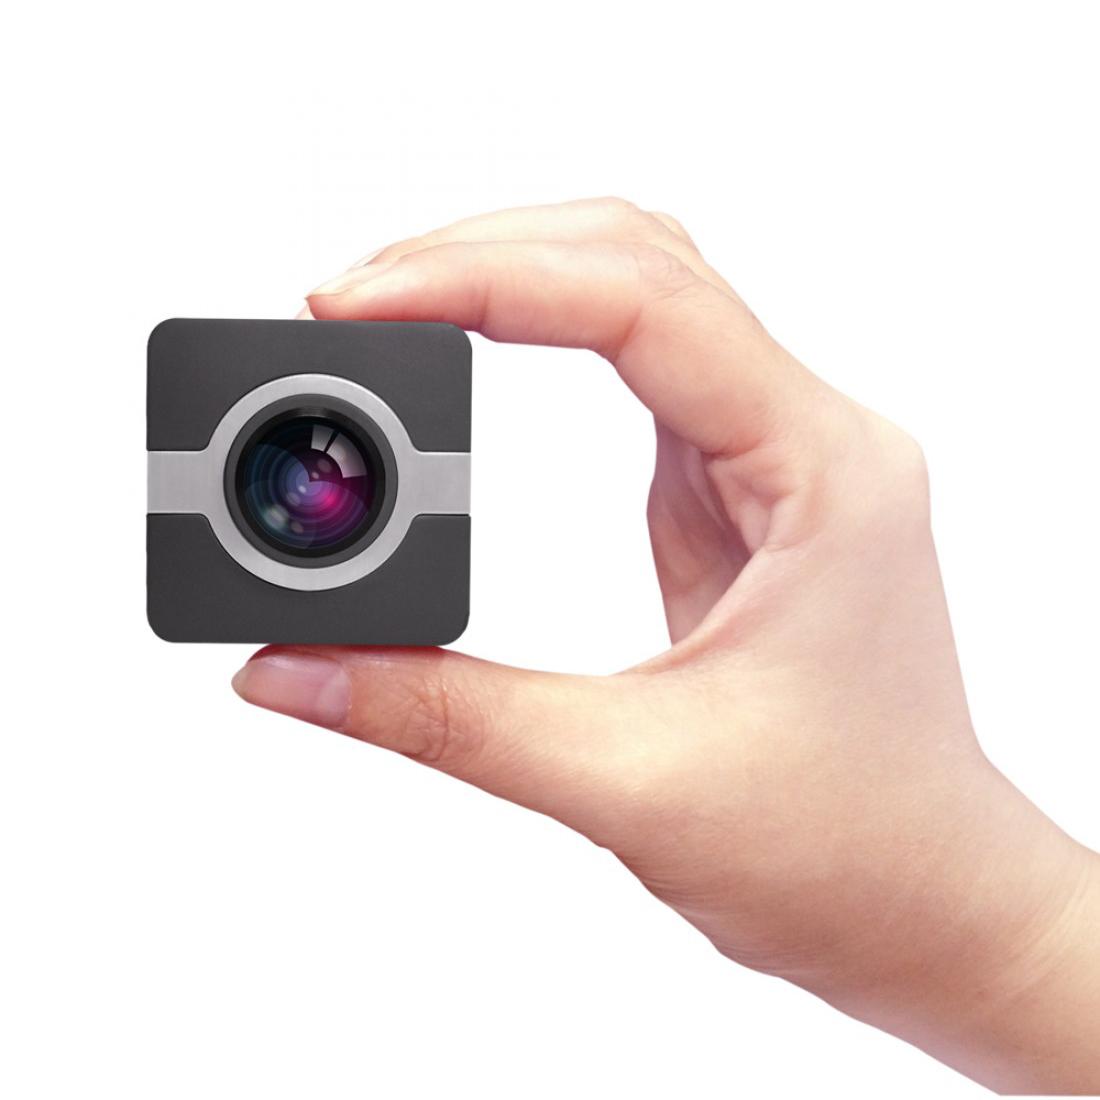 Matecam X1 Mini DVR Wifi APP HD 1080P 4K-HI Bike Helmet Cam Sports DV Action DVR Waterproof Dash Camera SONY LENS FHD Car Dash Cam Action Camera Cam Camcorder Black box Red (2)